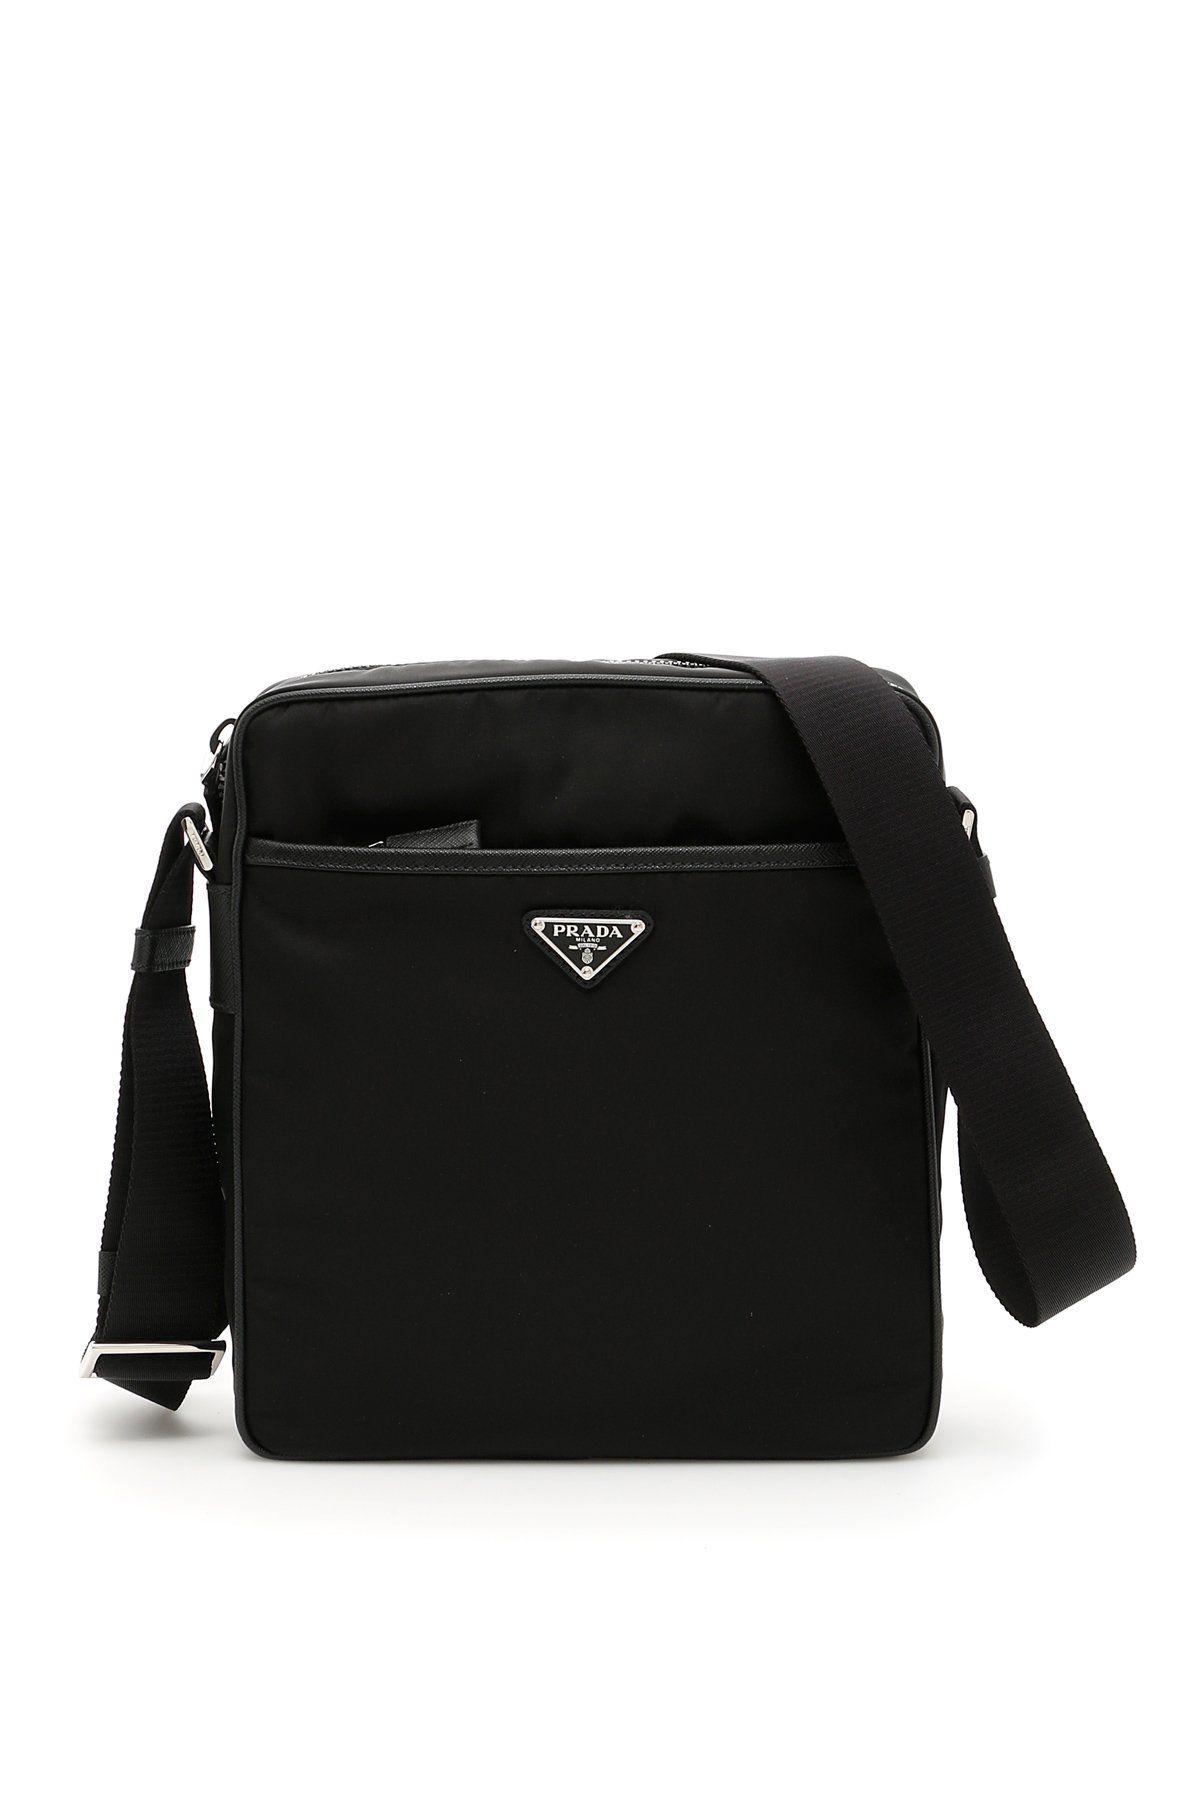 3893d70754ba0d PRADA PRADA NYLON MESSENGER BAG. #prada #bags #shoulder bags #leather #nylon